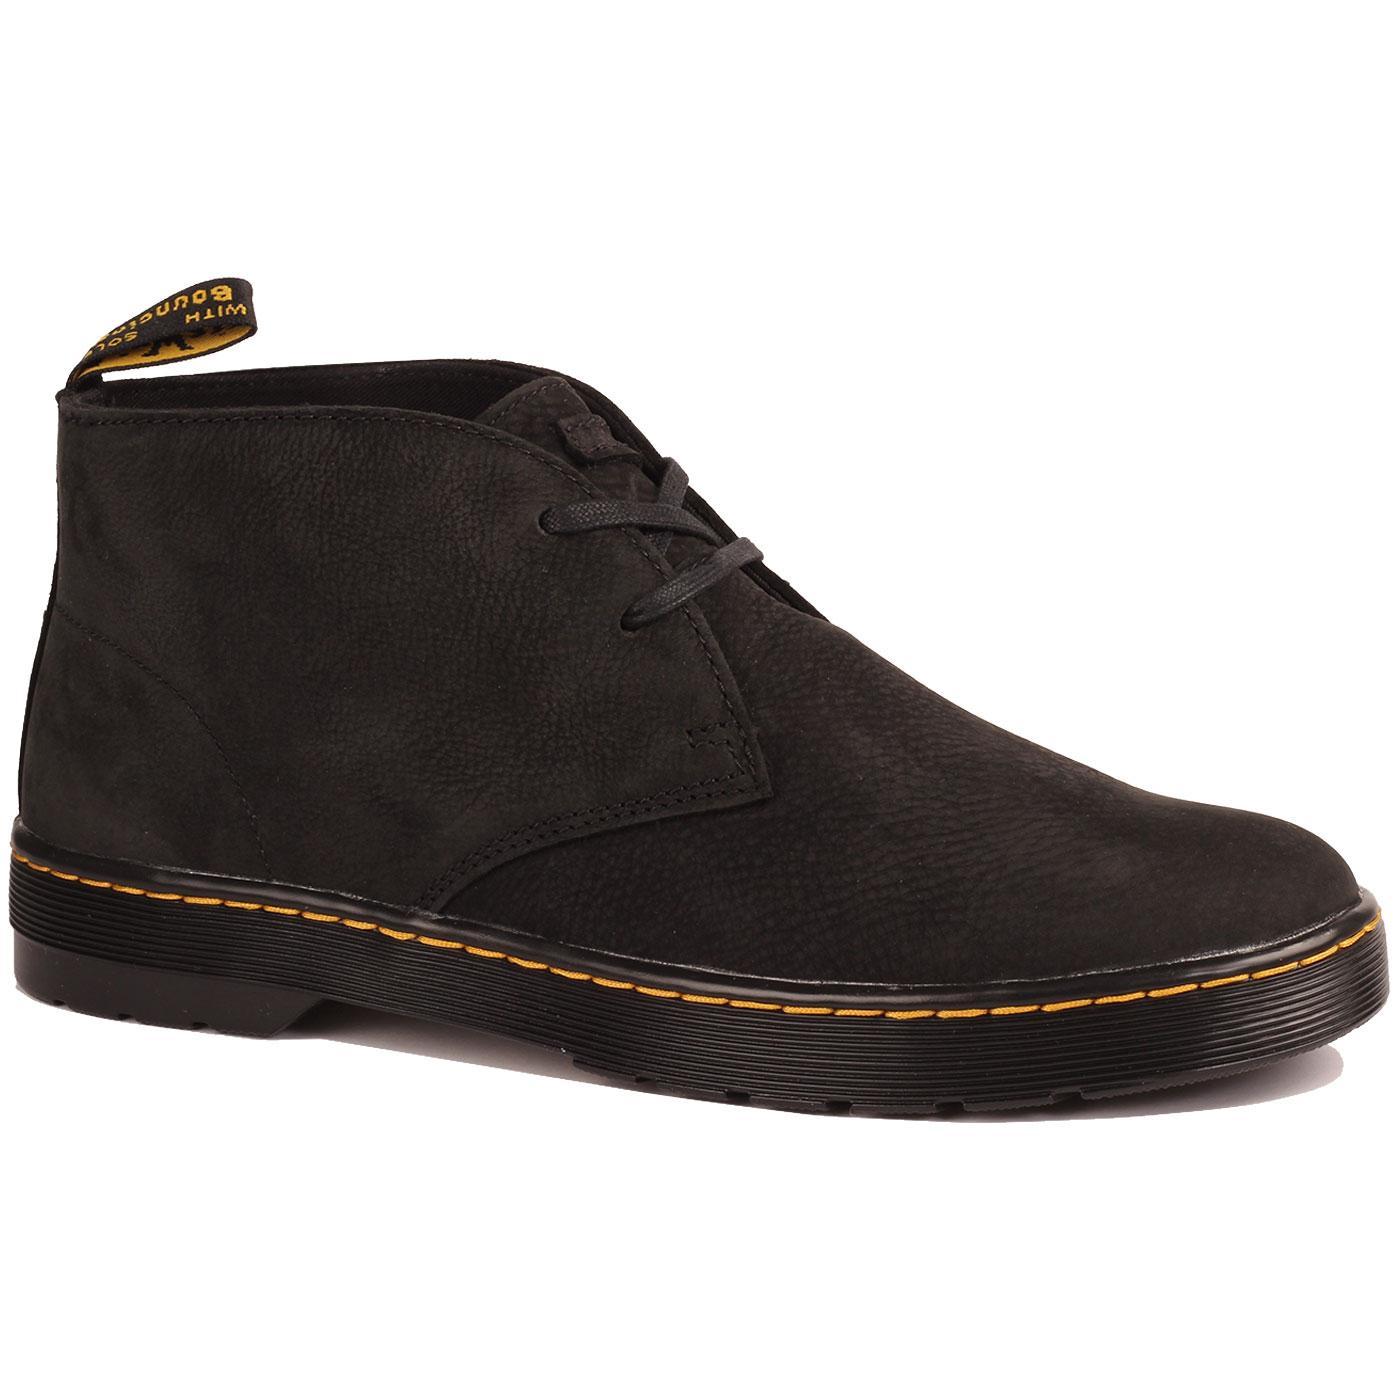 Cabrillo DR MARTENS Milled Nubuck Desert Boots